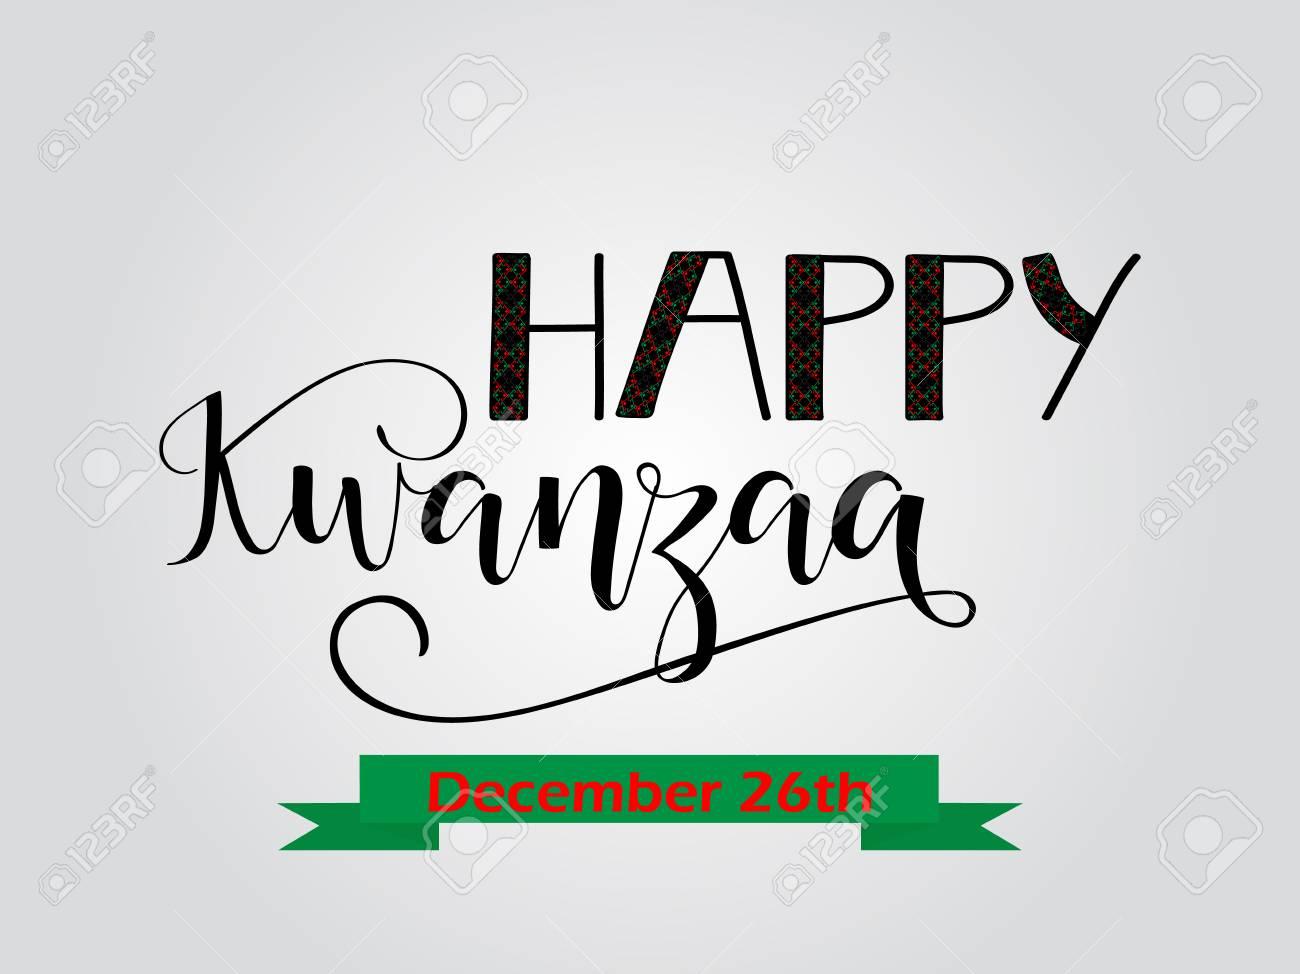 Happy kwanzaa decorative greeting card the celebration honors happy kwanzaa decorative greeting card the celebration honors african heritage in african american culture kristyandbryce Gallery